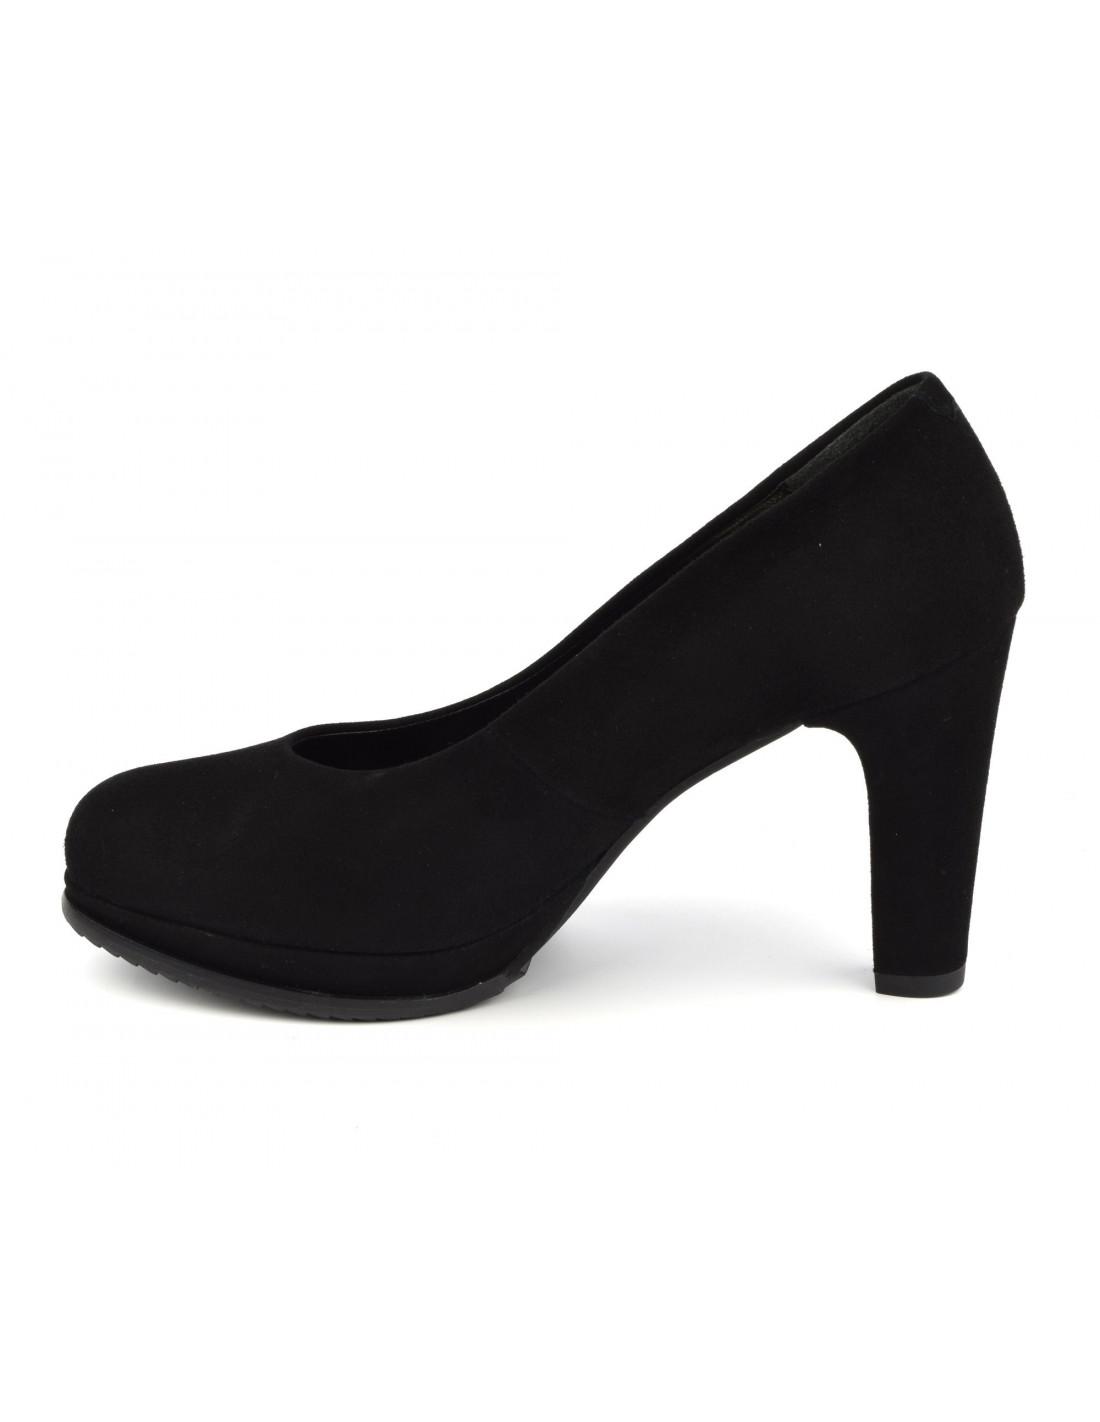 Escarpins plateforme, cuir daim noir, 1, Dansi